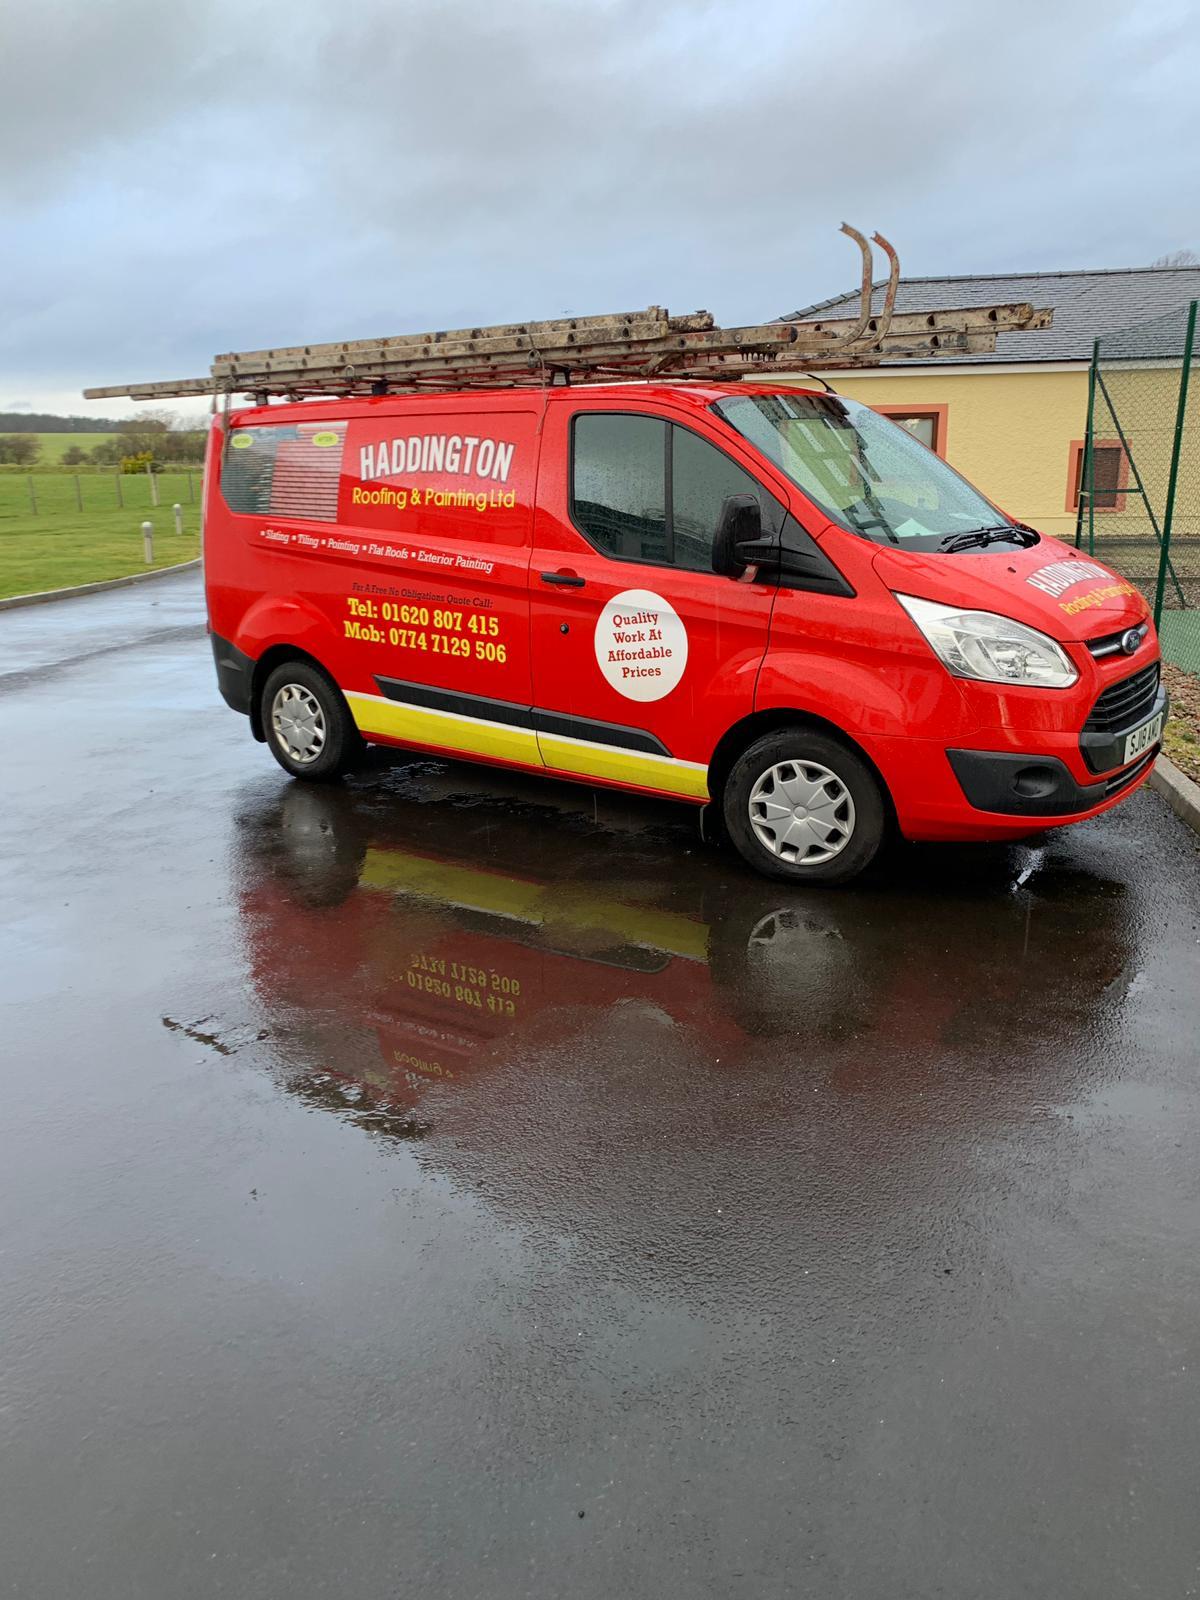 Main photo for Haddington Roofing & Painting Ltd